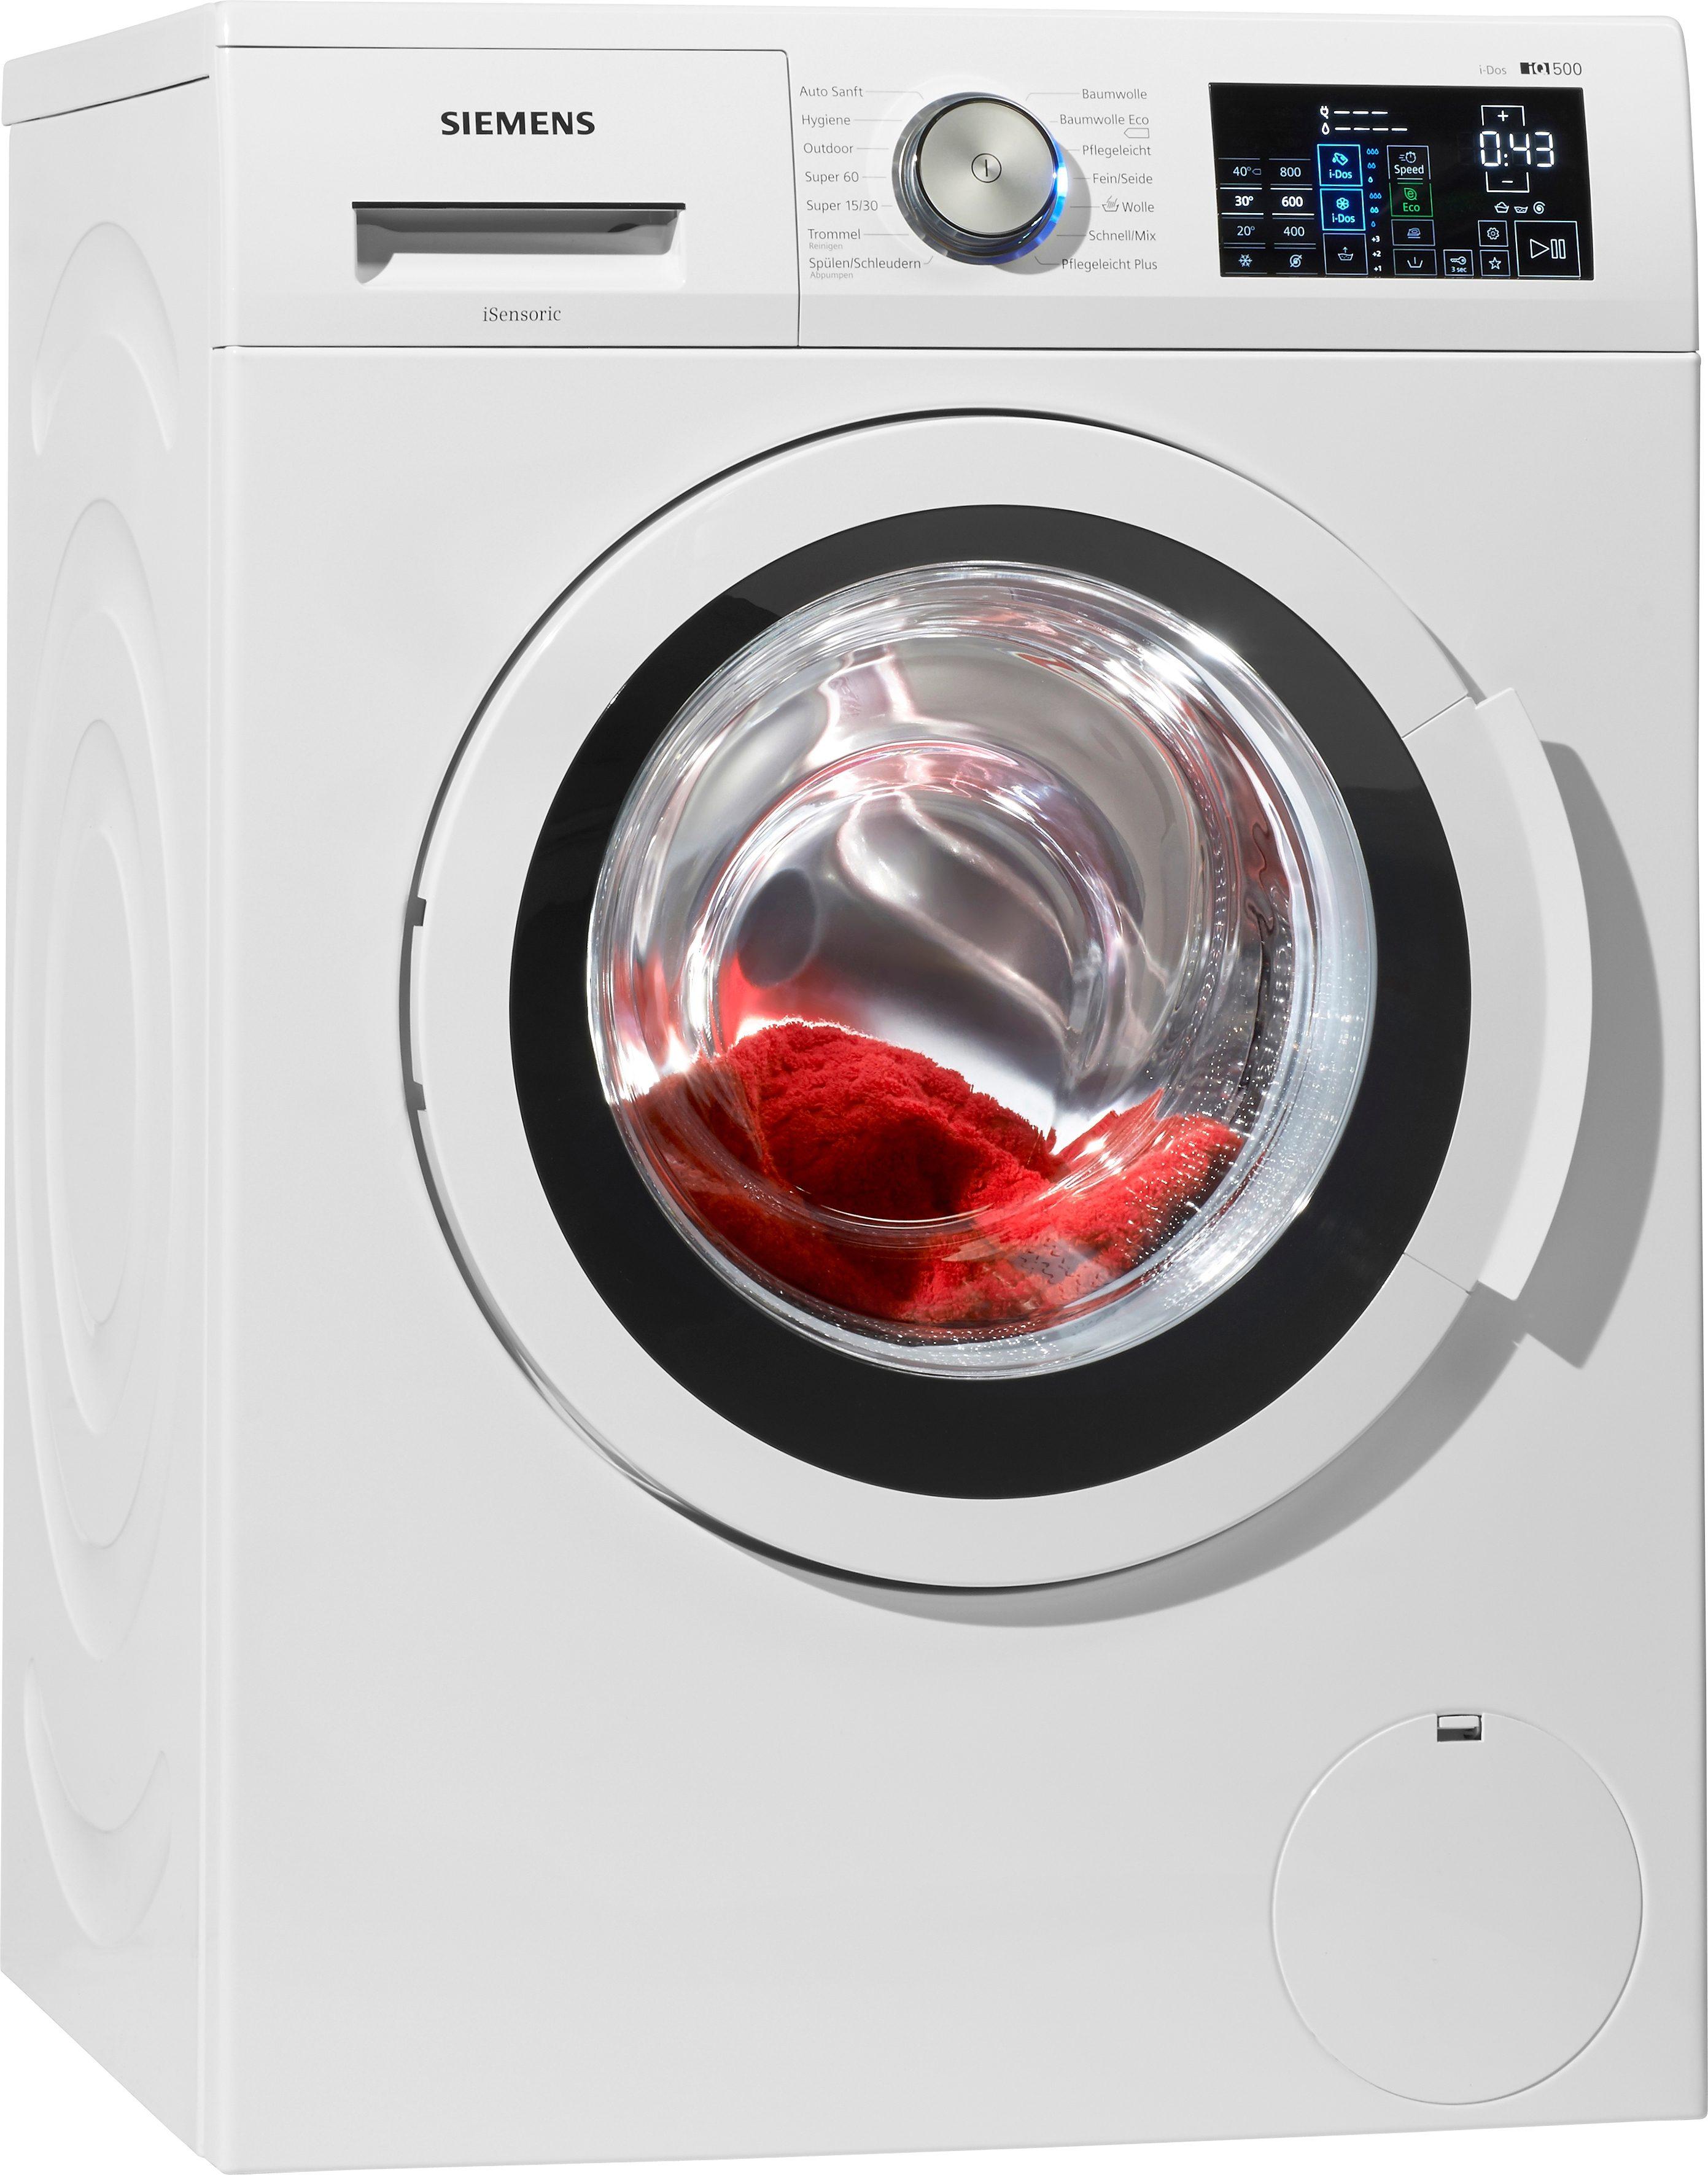 SIEMENS Waschmaschine iQ500 WM14T640 i-Dos, A+++, 8 kg, 1400 U/Min